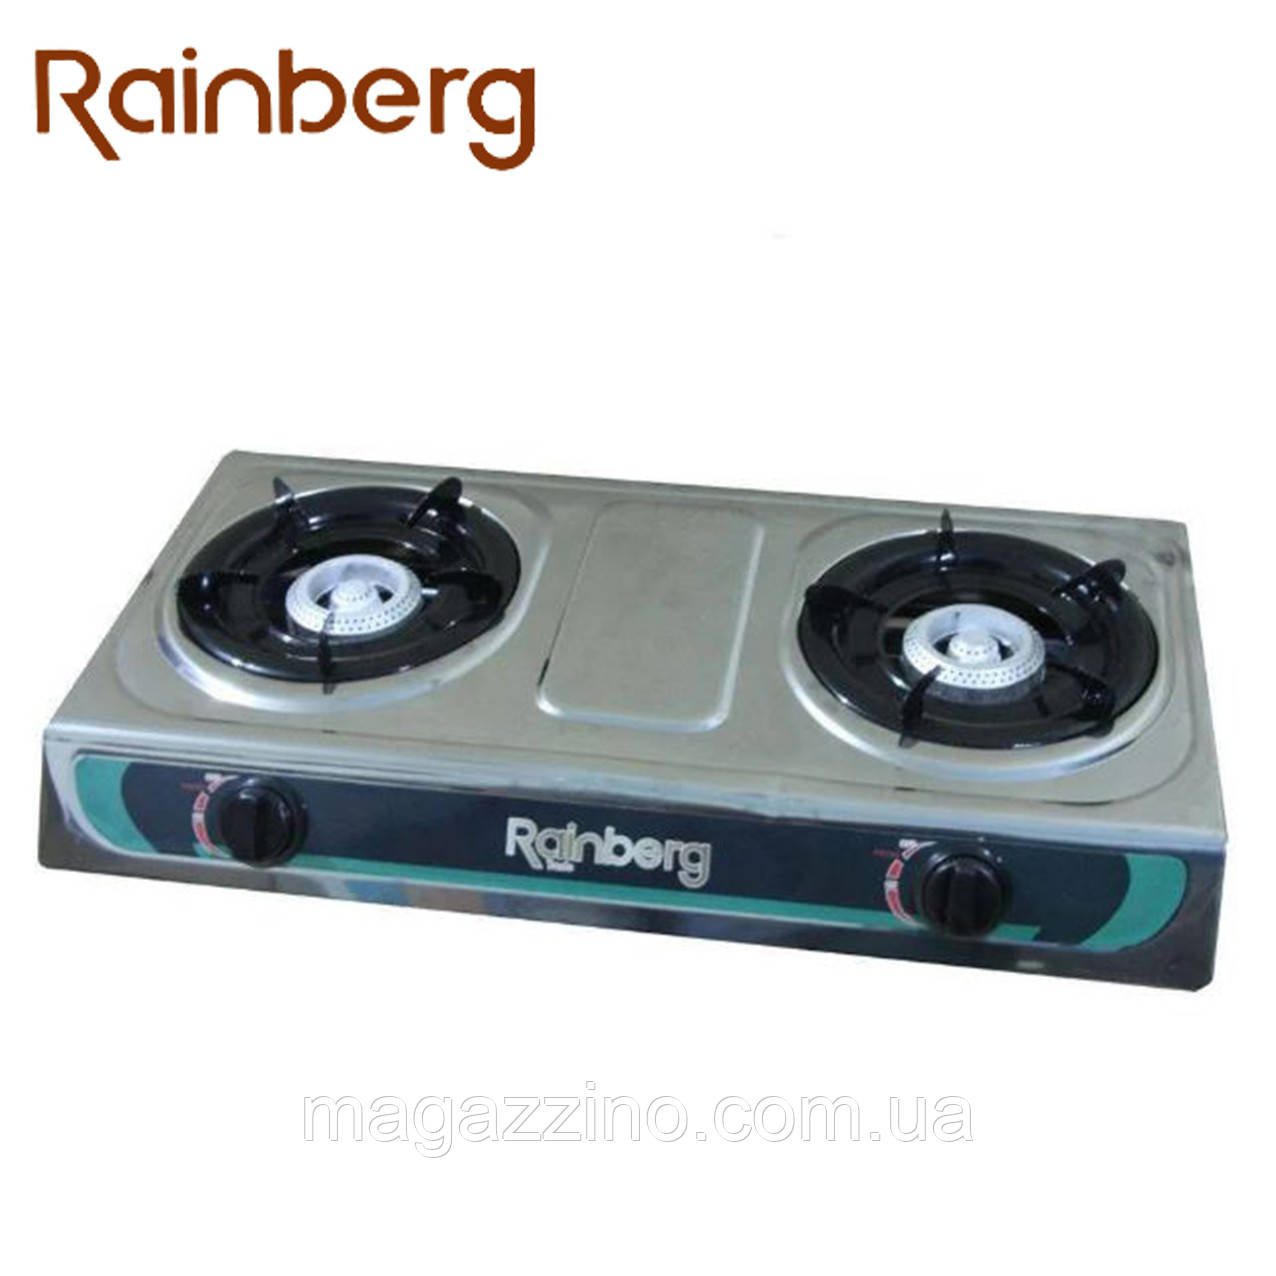 Газовая плита на 2 конфорки Rainberg Gas Stove G-02